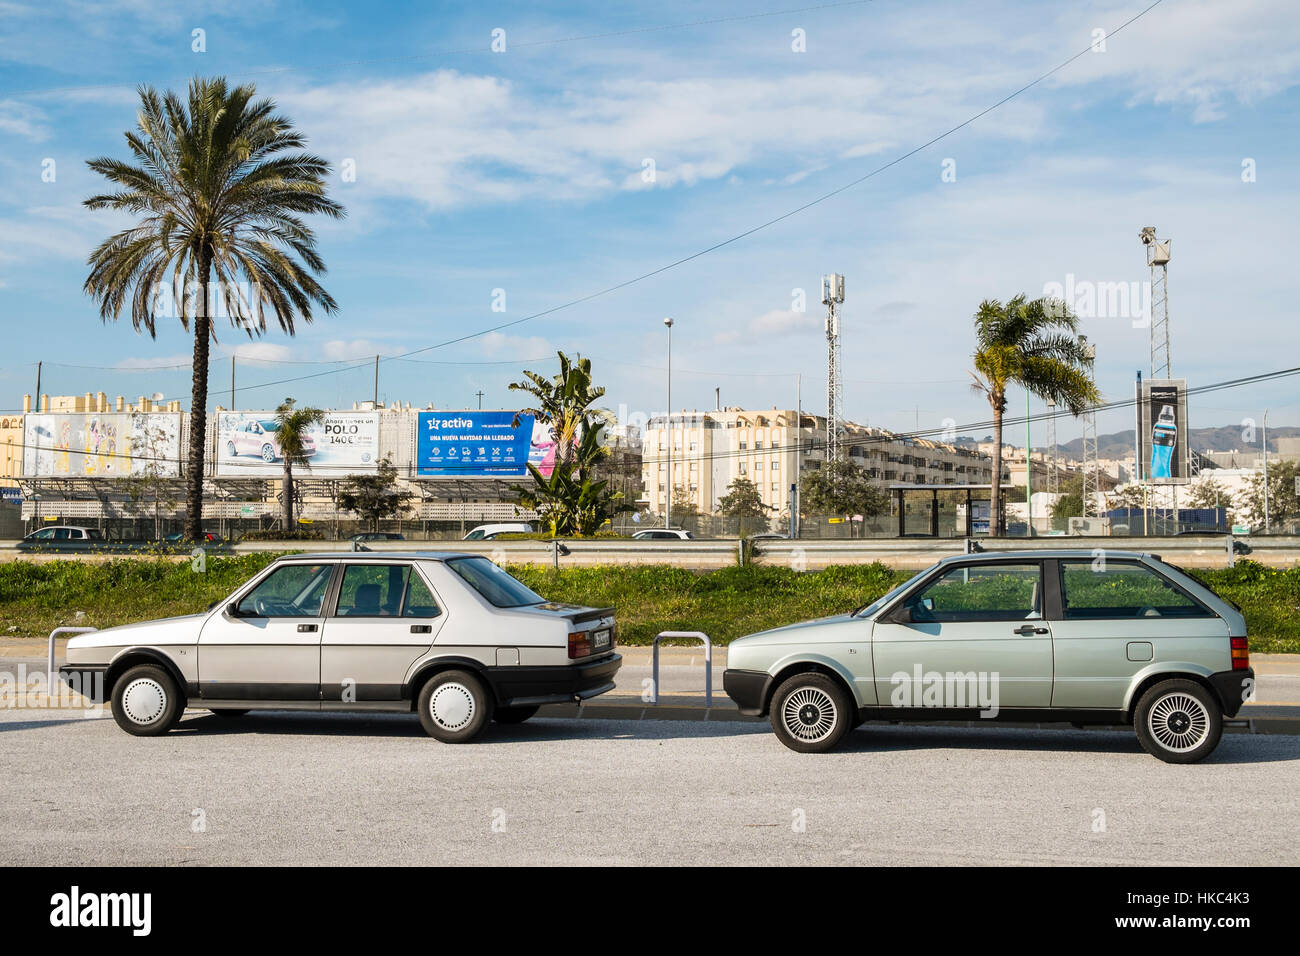 1990 Seat Malaga 1.2 - 1986 Seat Ibiza 1.2 GLX - Stock Image